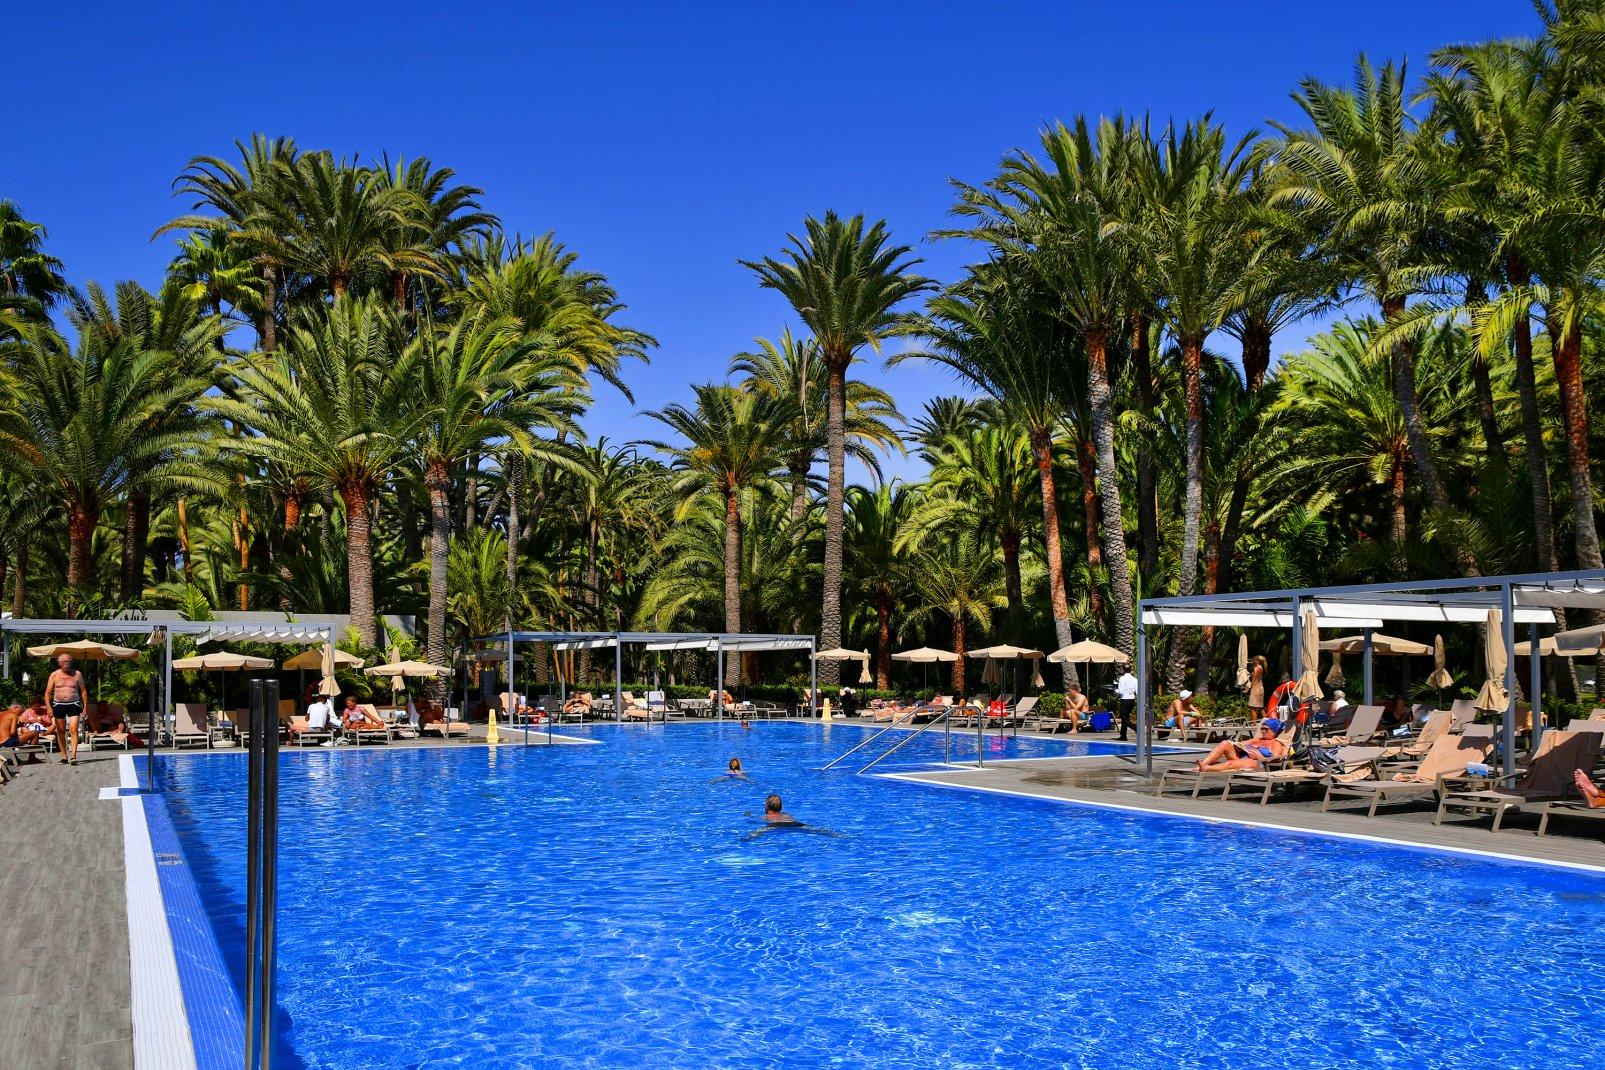 Hôtel Riu Palace Oasis 4* - 1